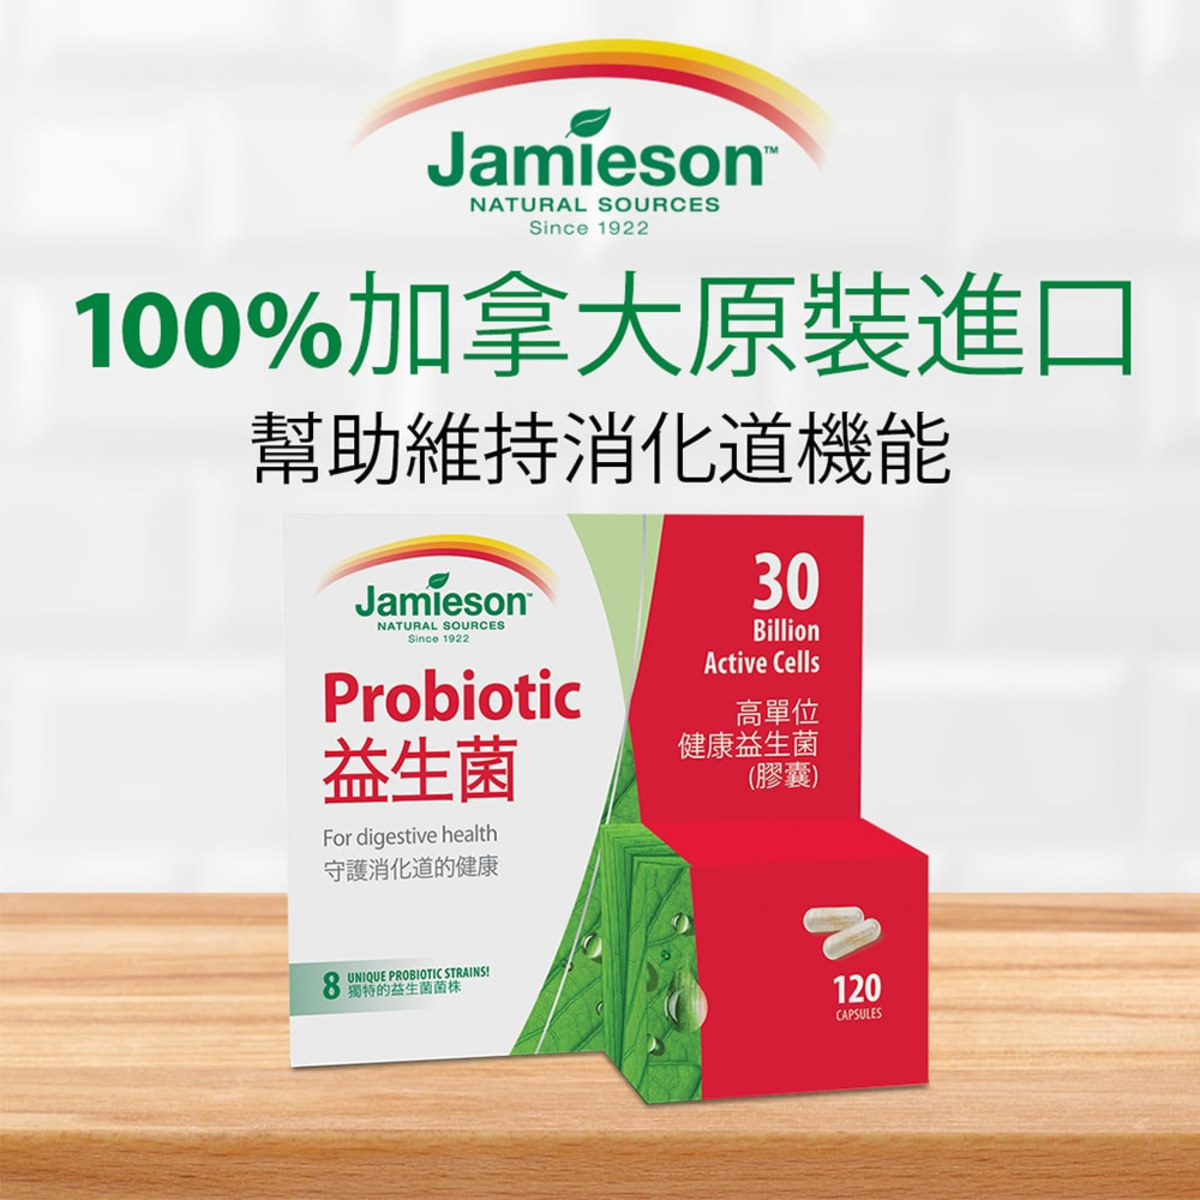 Jamieson 高單位3百億健康益生菌膠囊 120顆